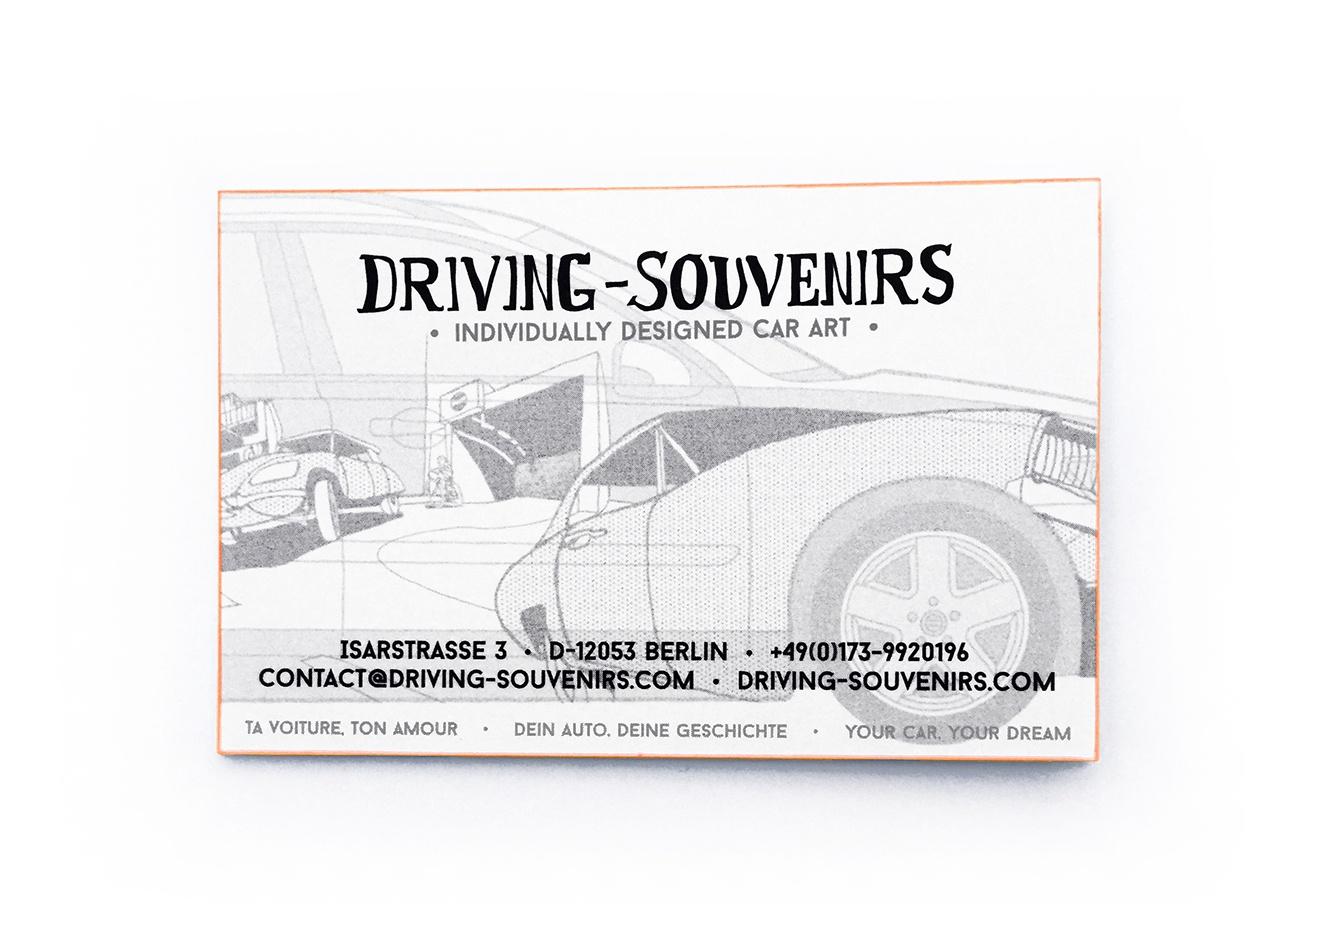 Driving Souvenirs Individually Designed Car Art Contact